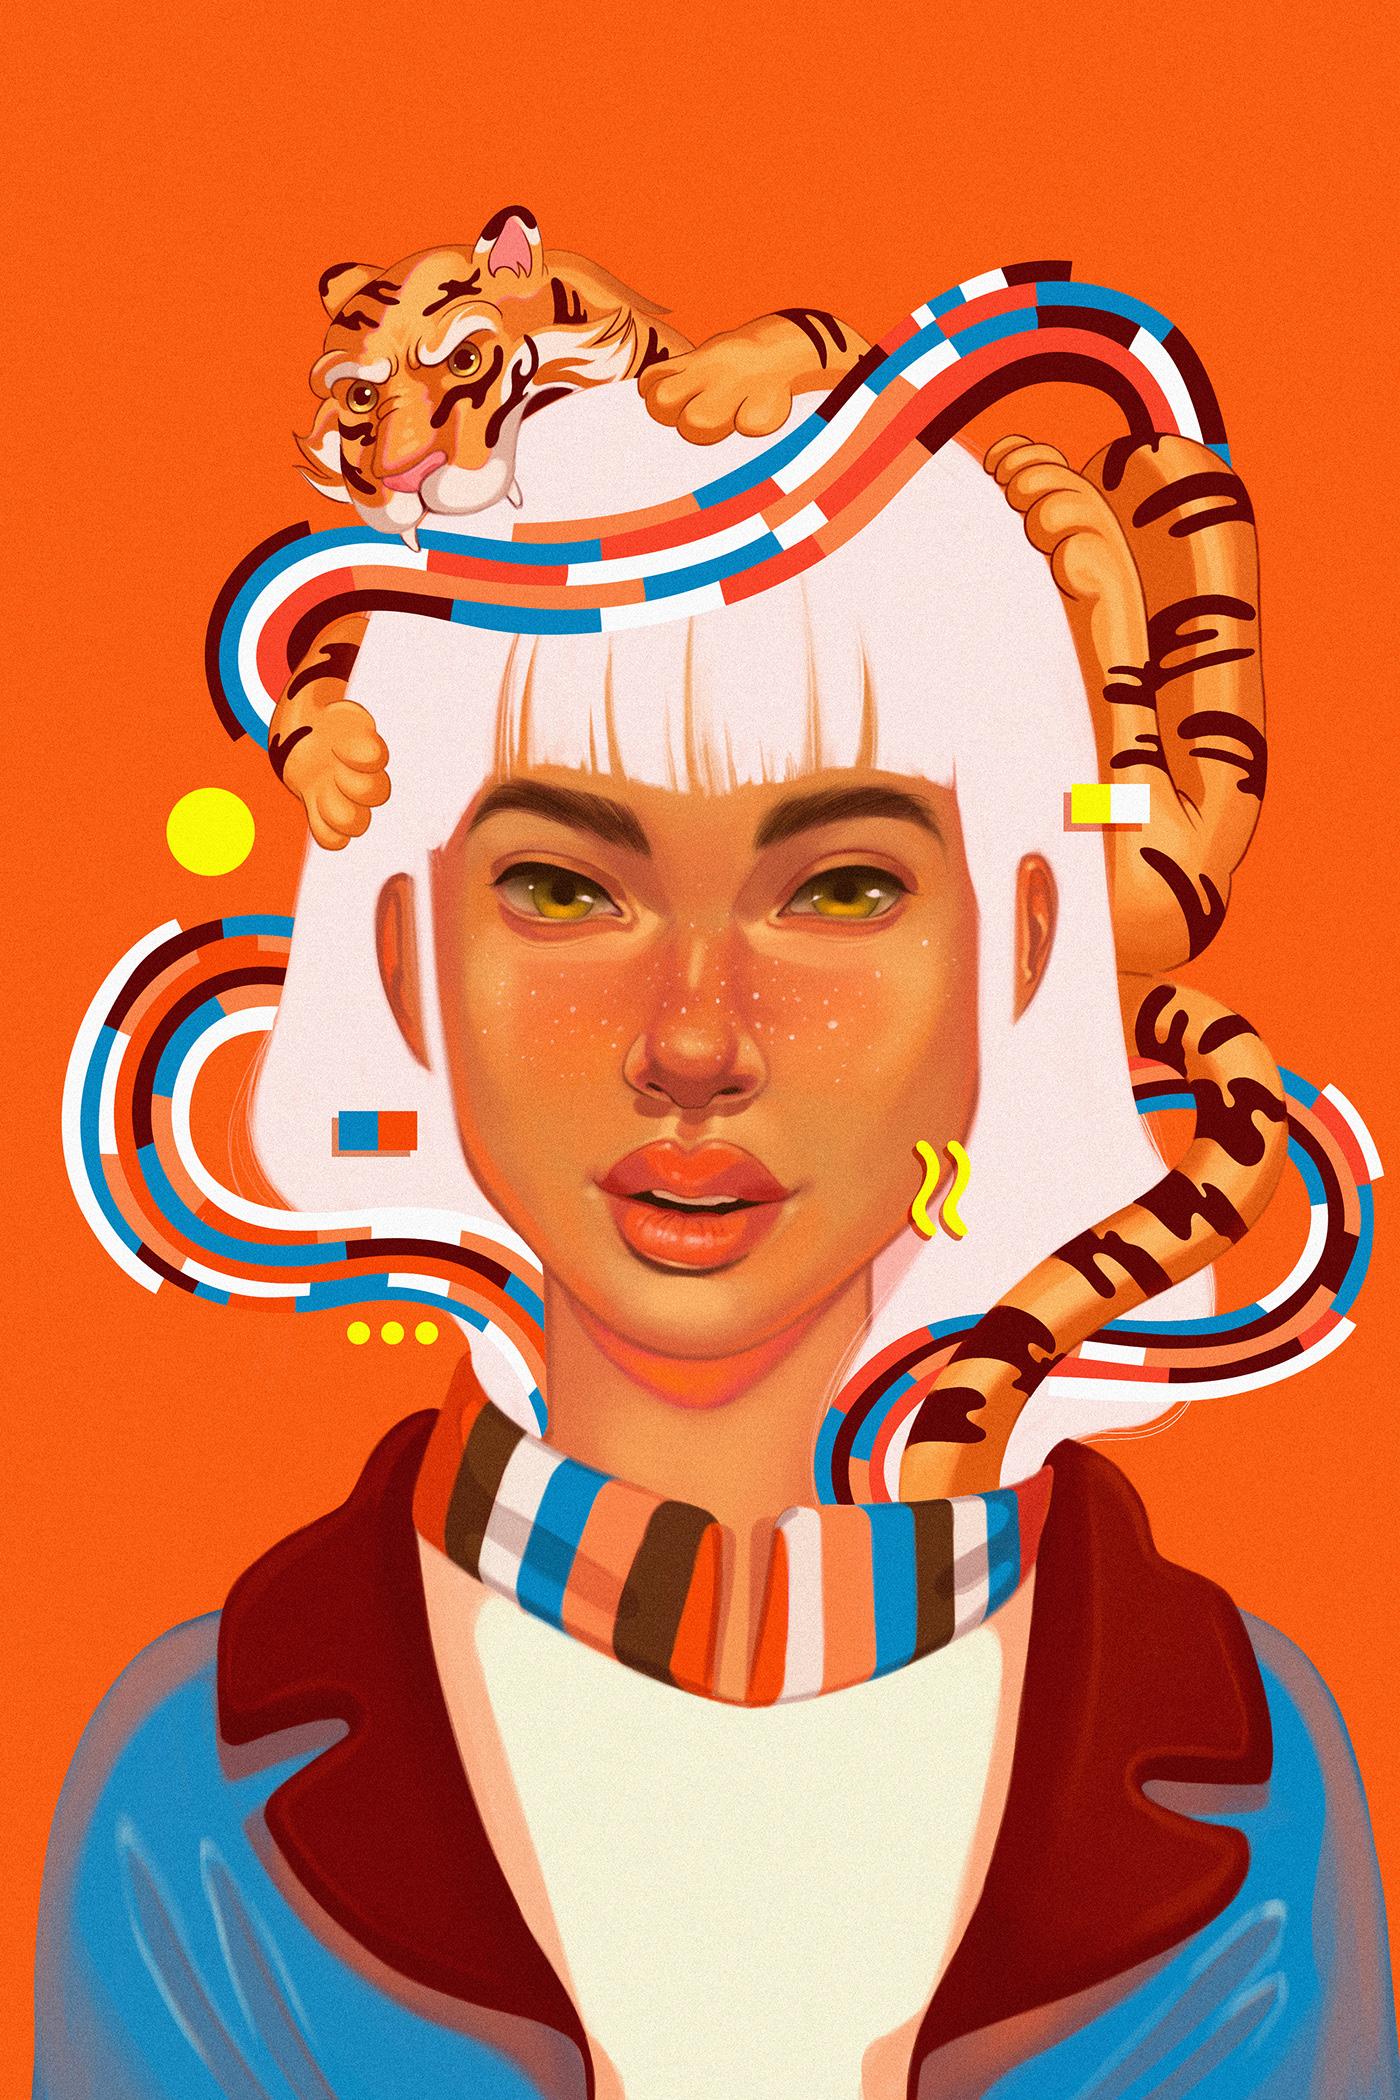 bad bunny colombia digital illustration digital painting Dua Lipa germangonzalez music nft nftart SOSCOLOMBIA